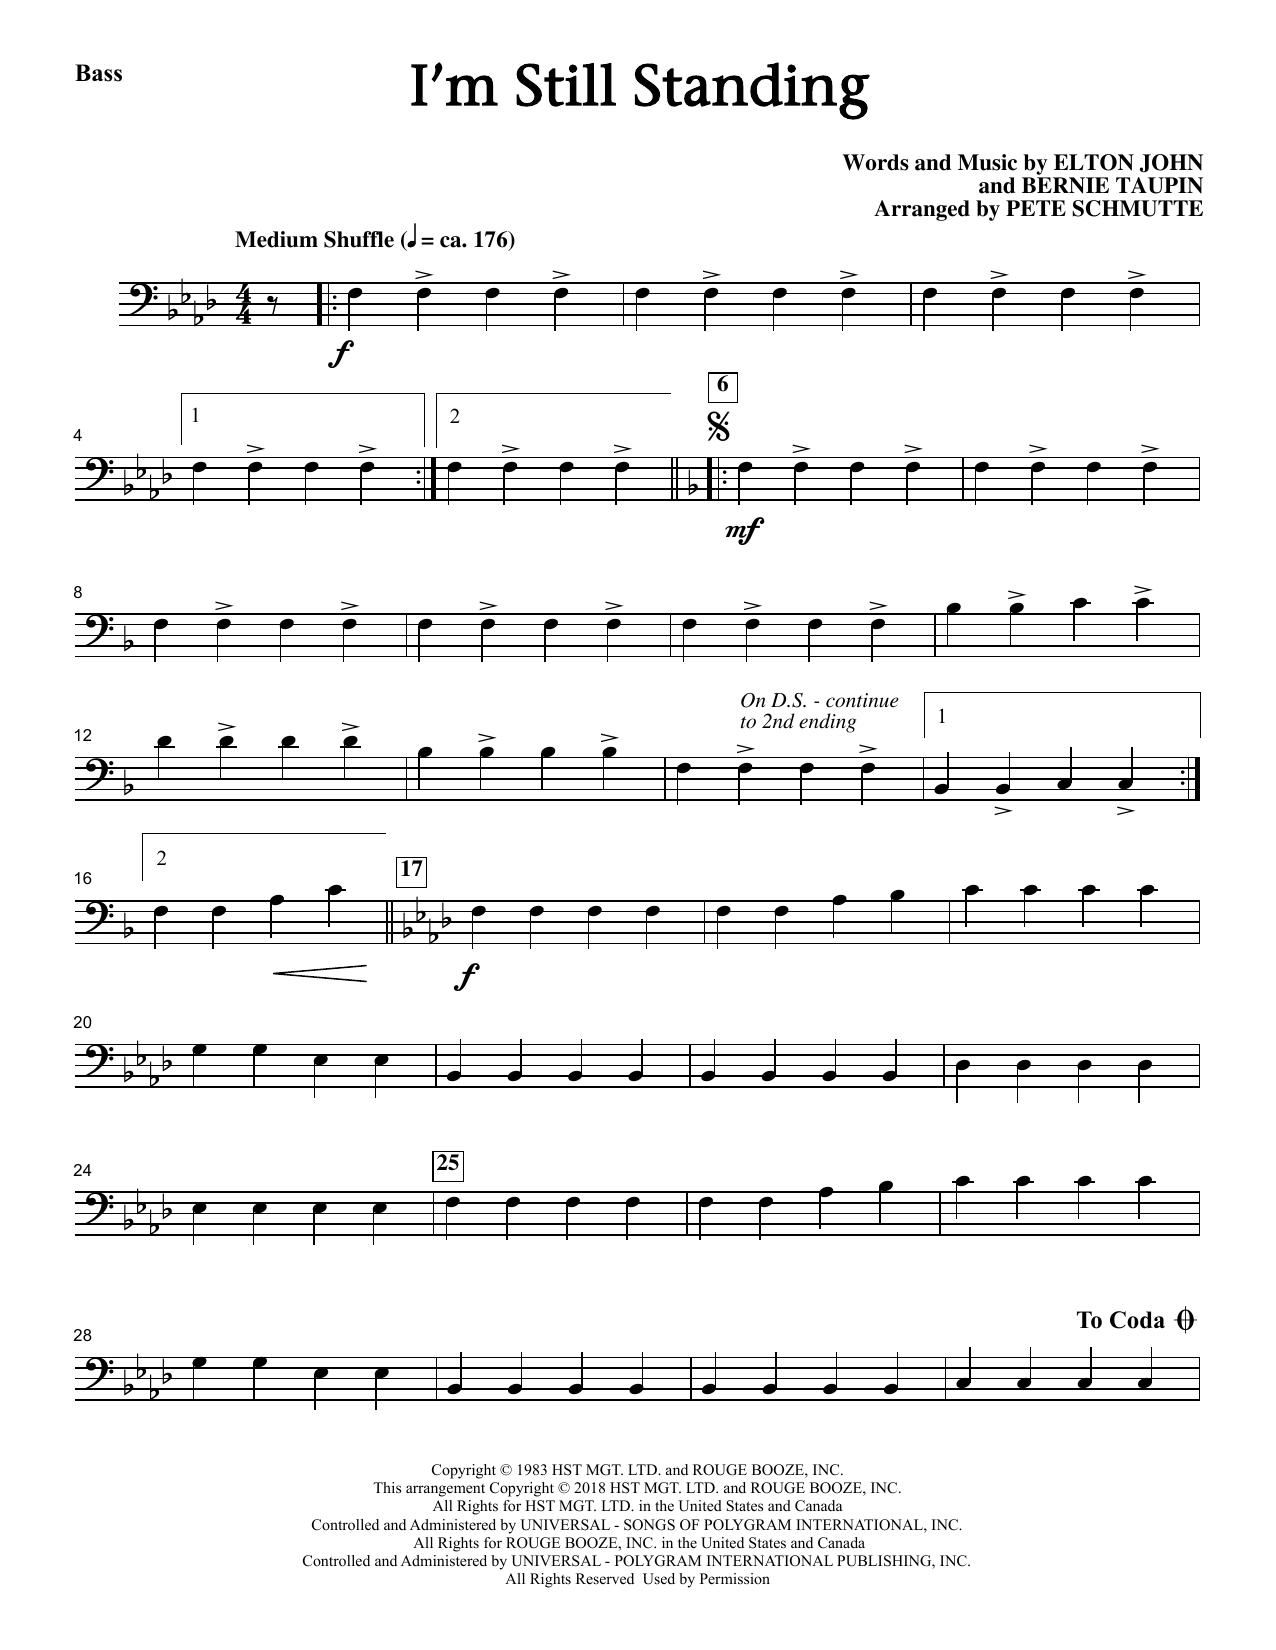 Elton John I'm Still Standing (arr. Pete Schmutte) - Bass sheet music notes and chords. Download Printable PDF.